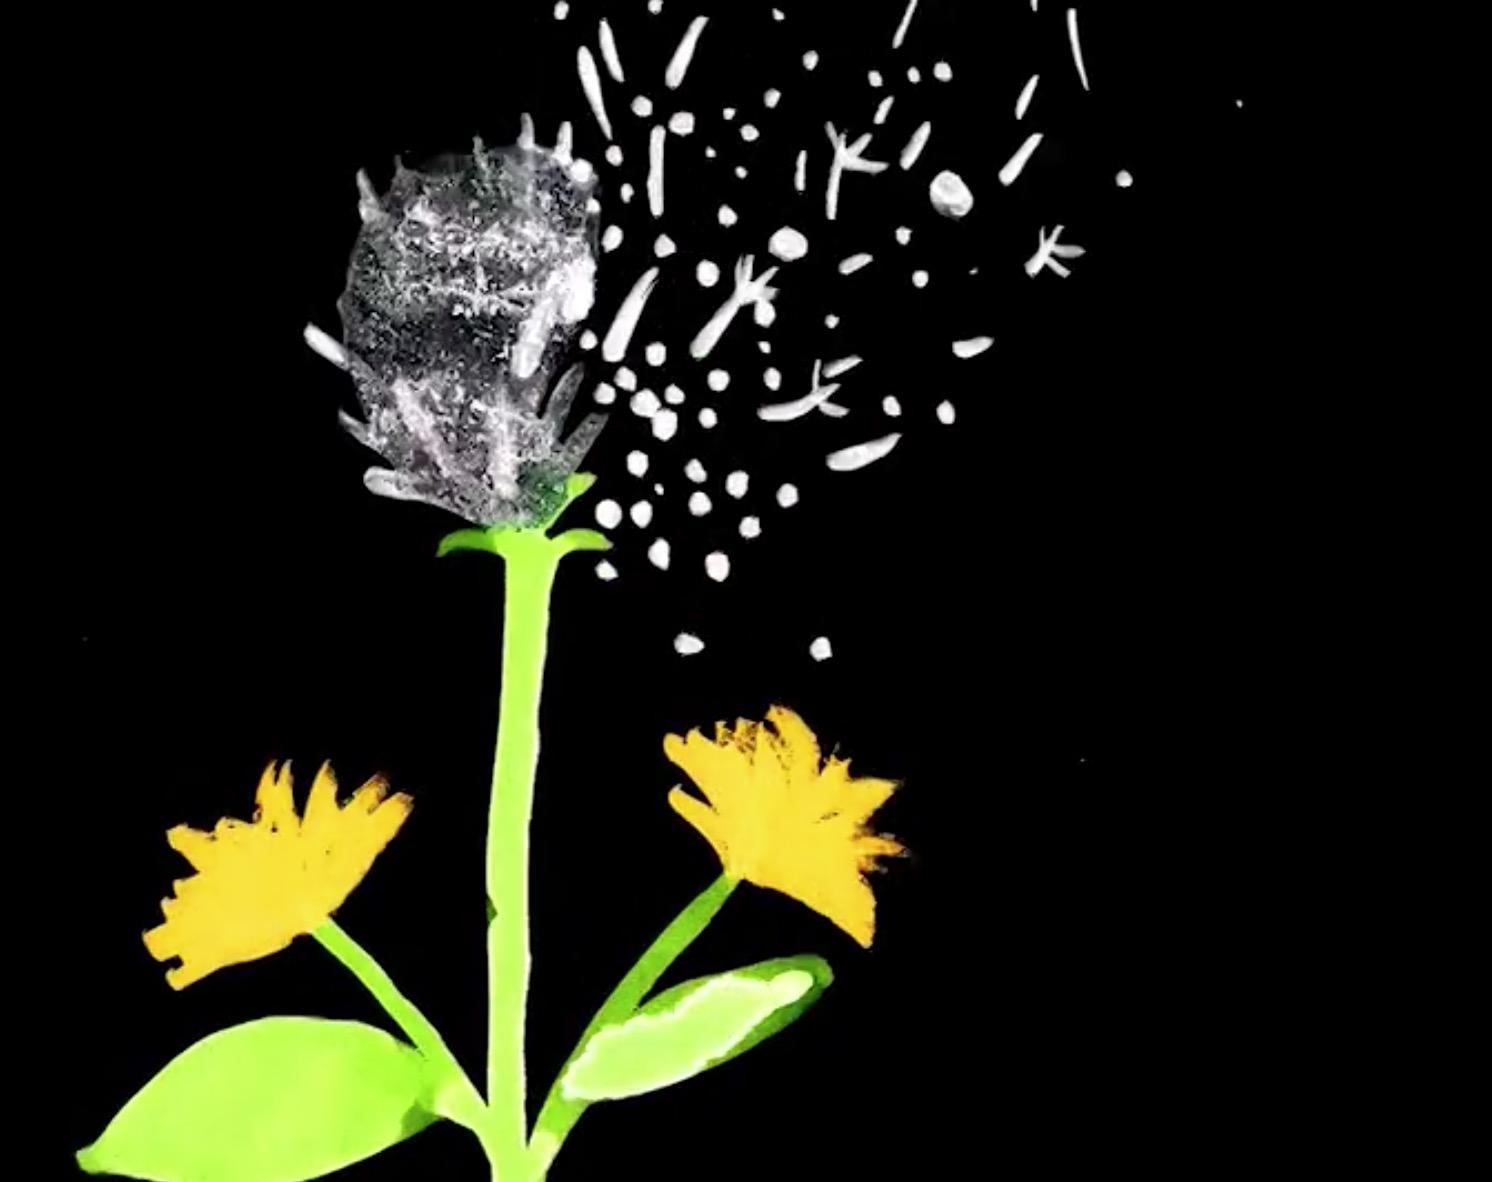 fiori di tarassaco 6